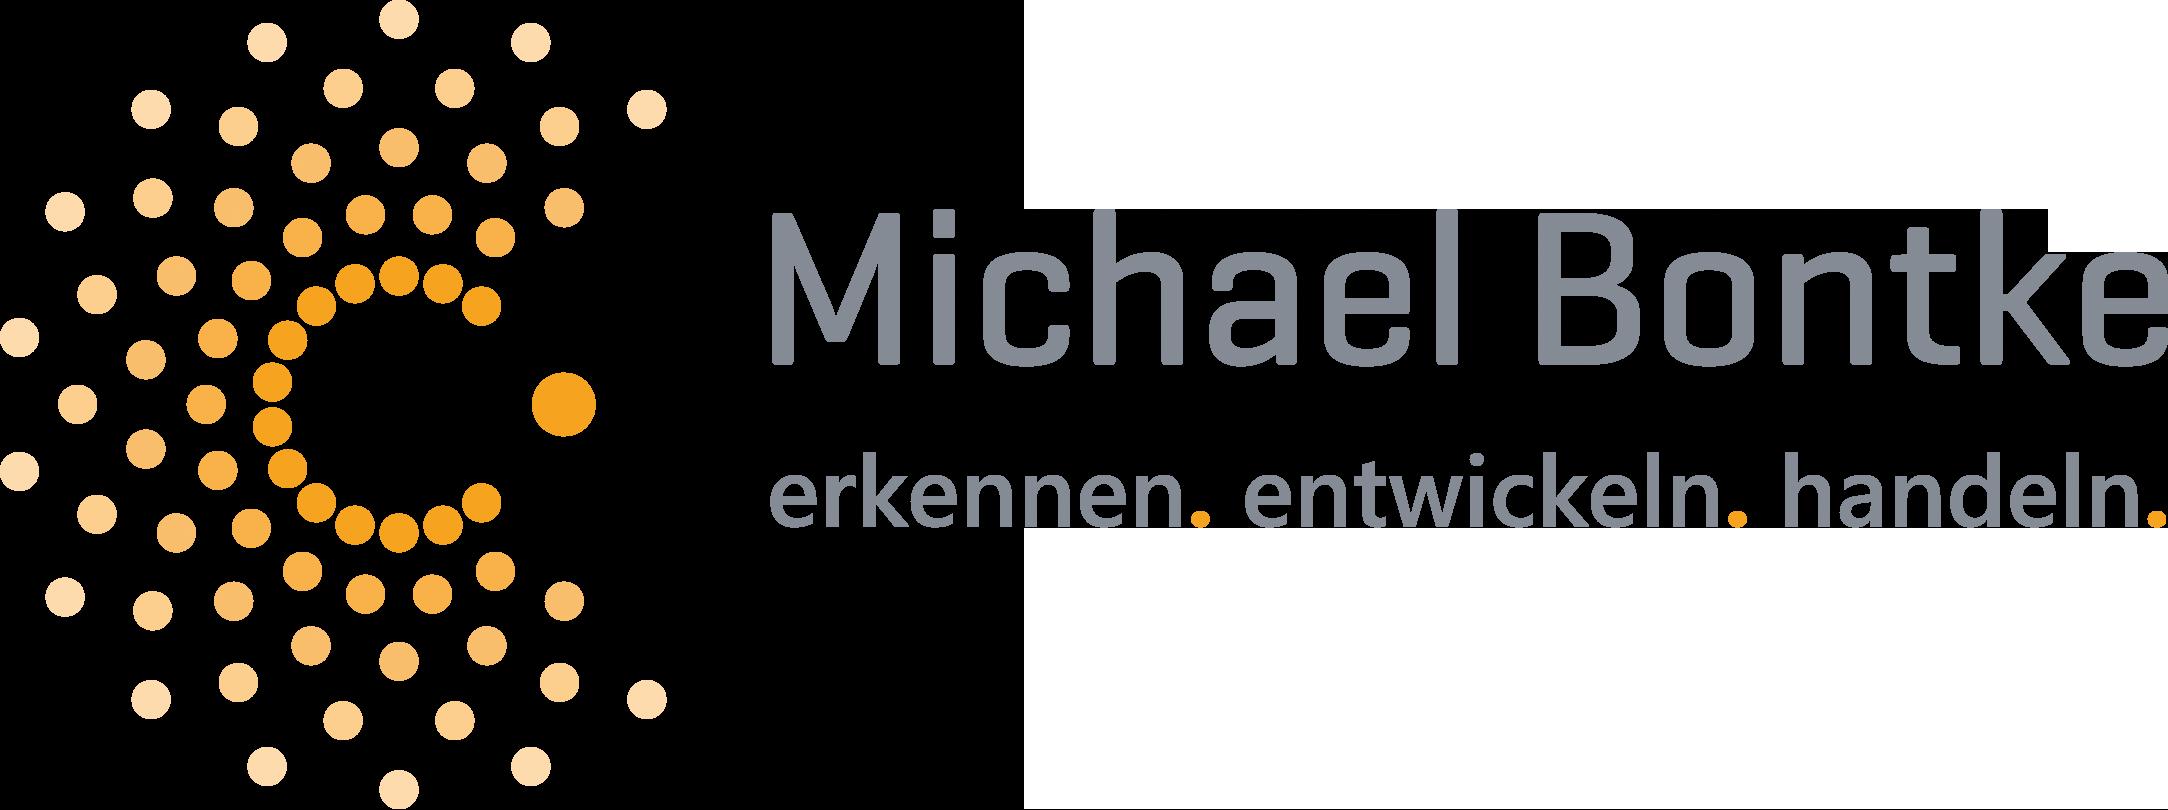 Michael Bontke